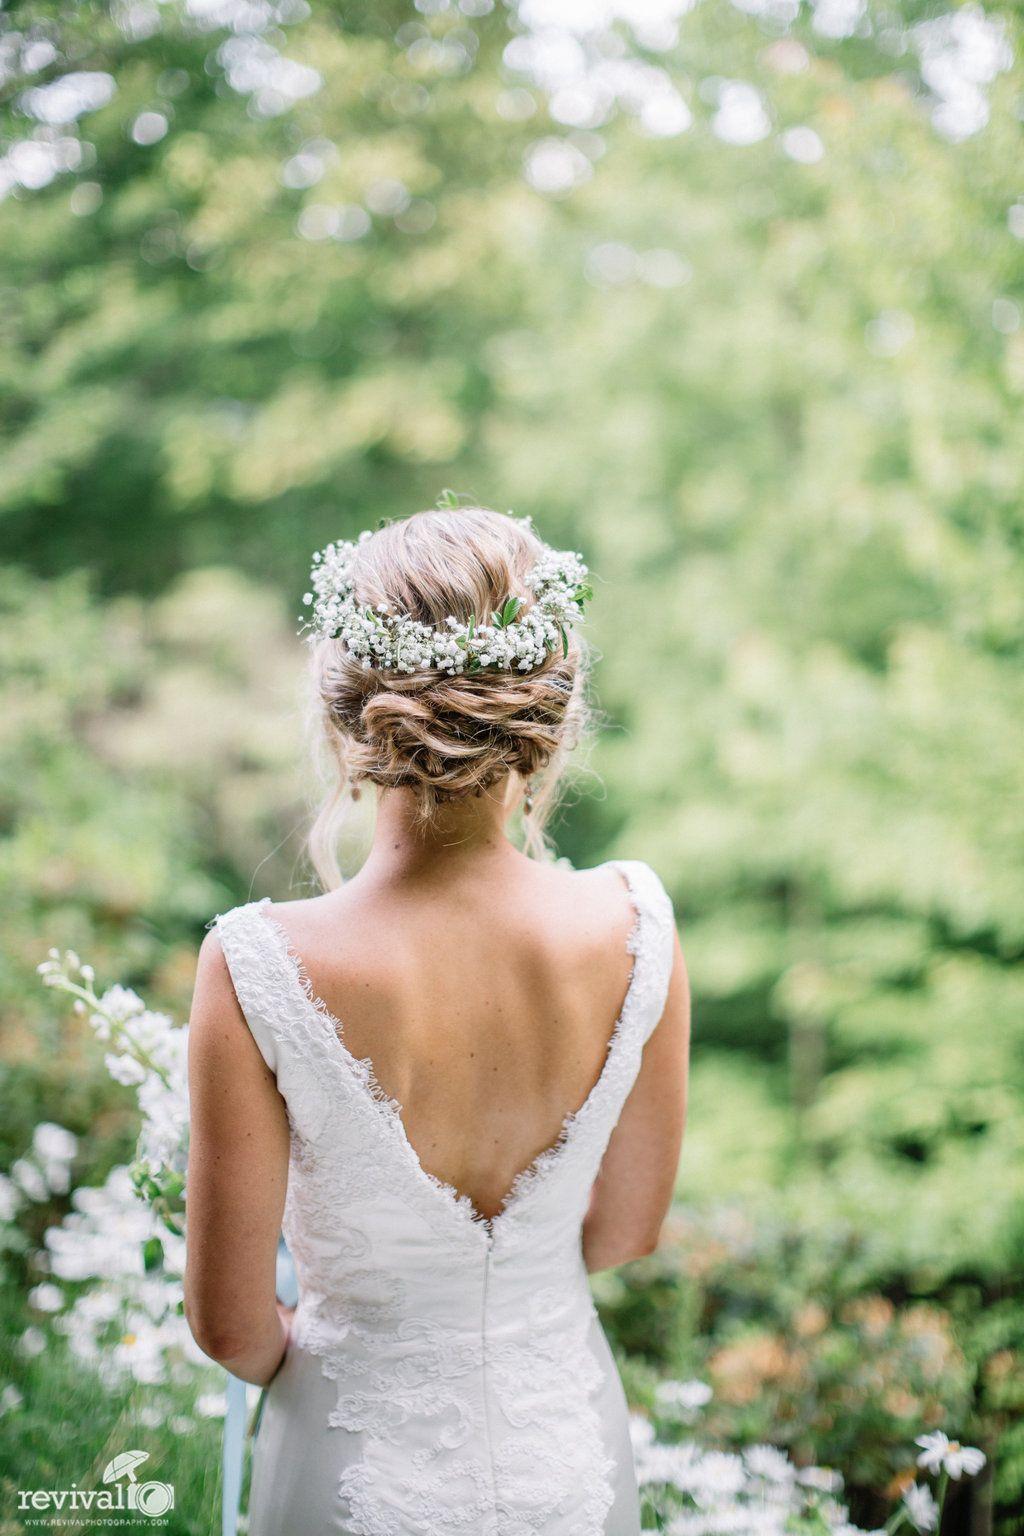 hair and makeup by heather, hairstyles, bridal hair, bridal makeup